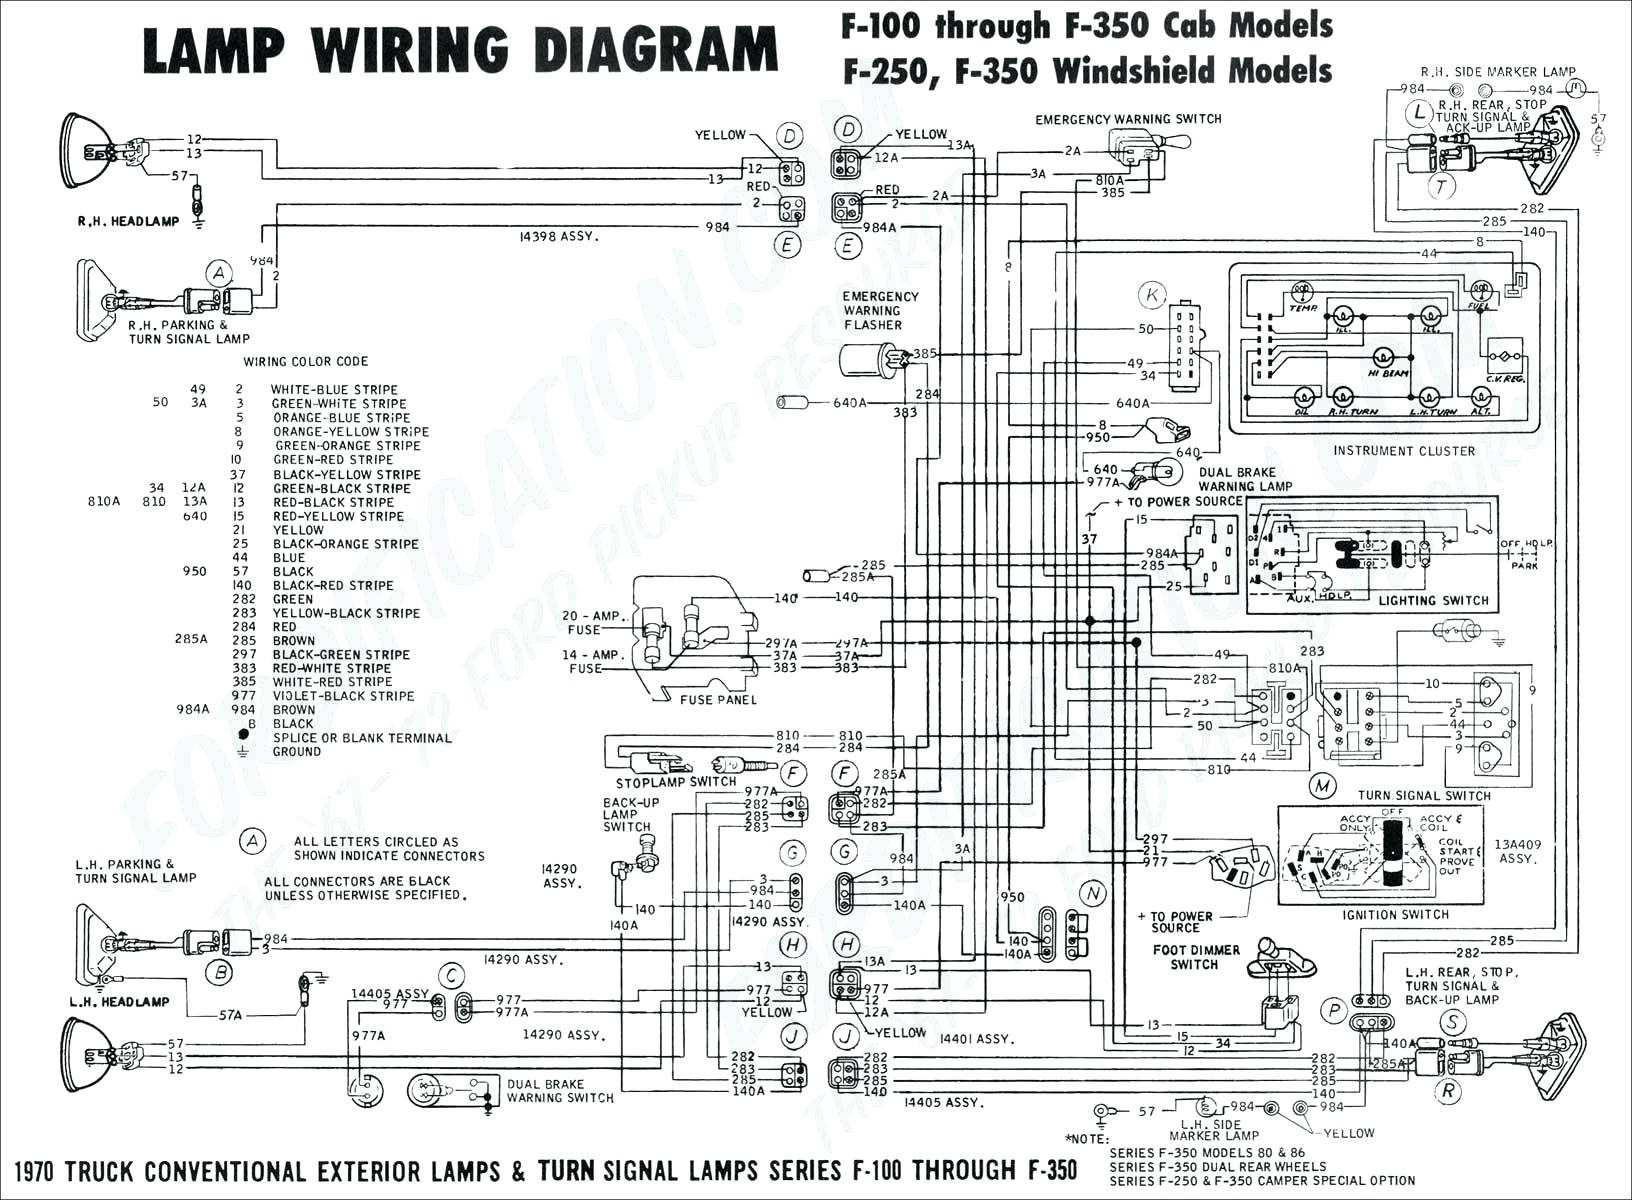 Ram Tail Light Wire Diagram Elegant